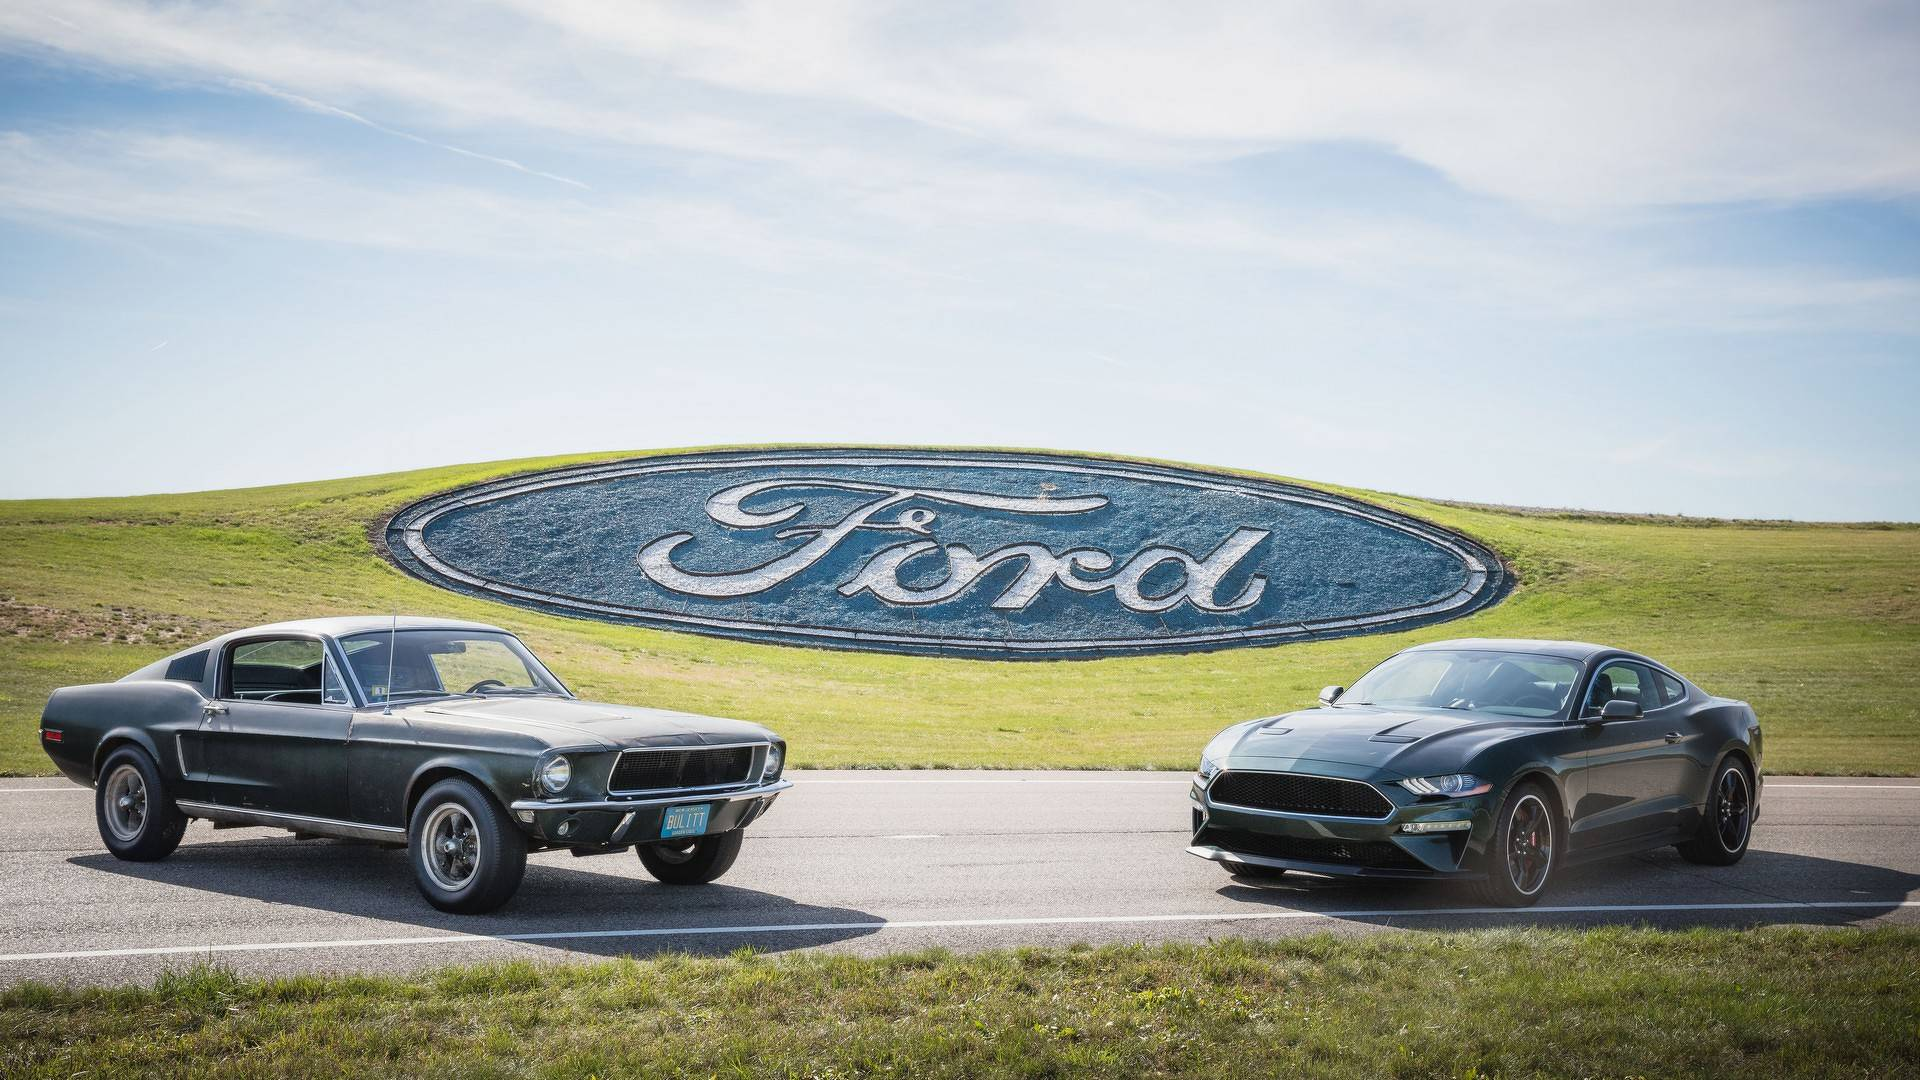 2020 Model Year Will Be The Last For The Bullitt Mustang